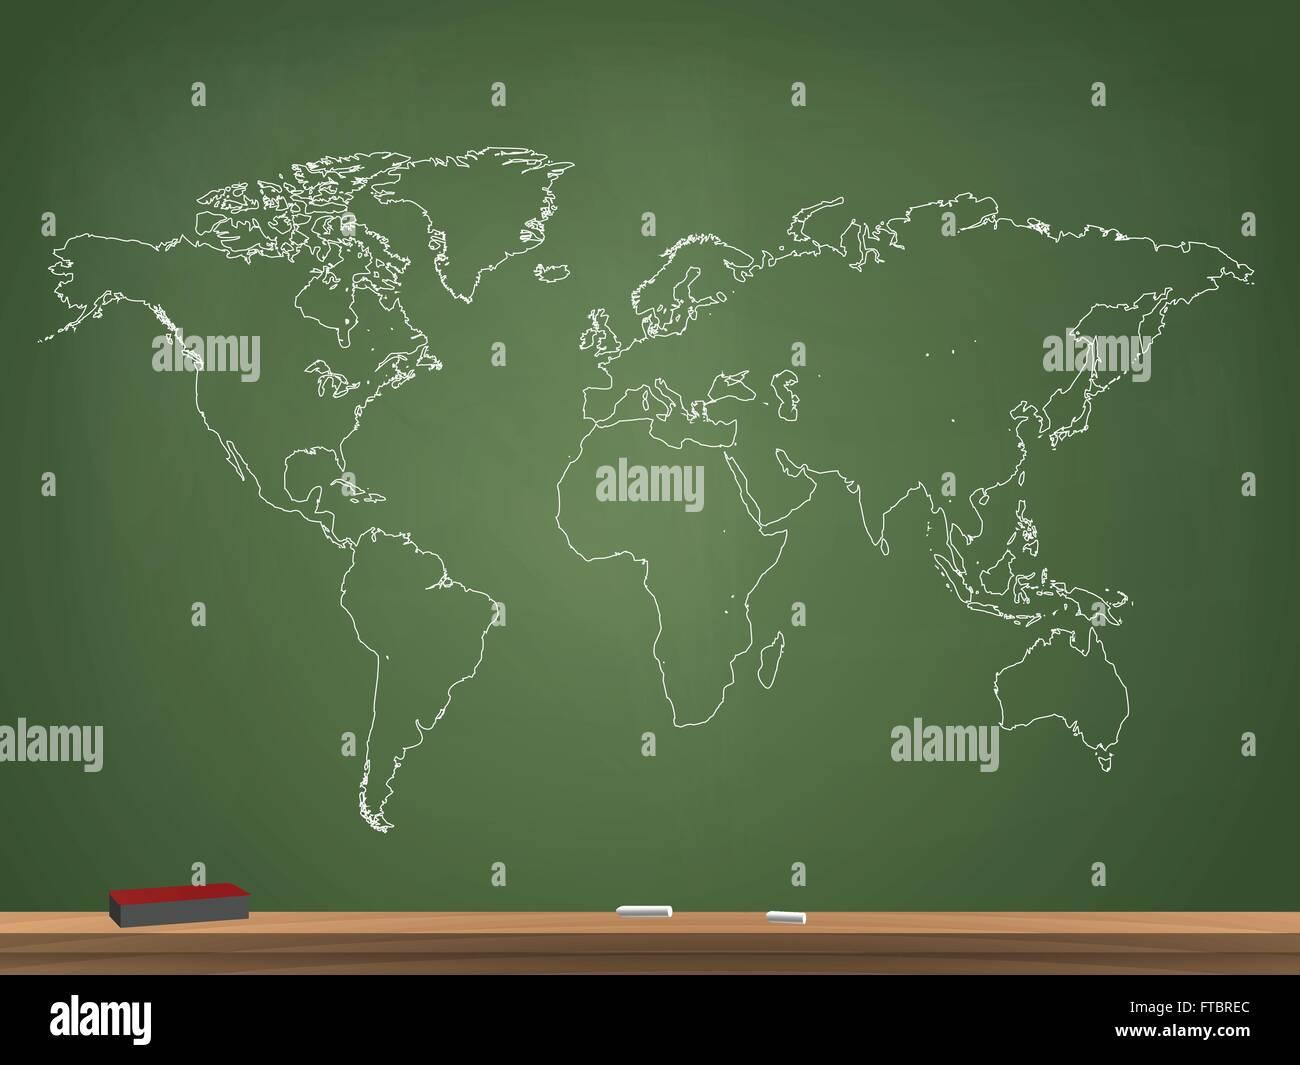 Realistic chalkboard world map vector illustration stock vector art realistic chalkboard world map vector illustration gumiabroncs Choice Image